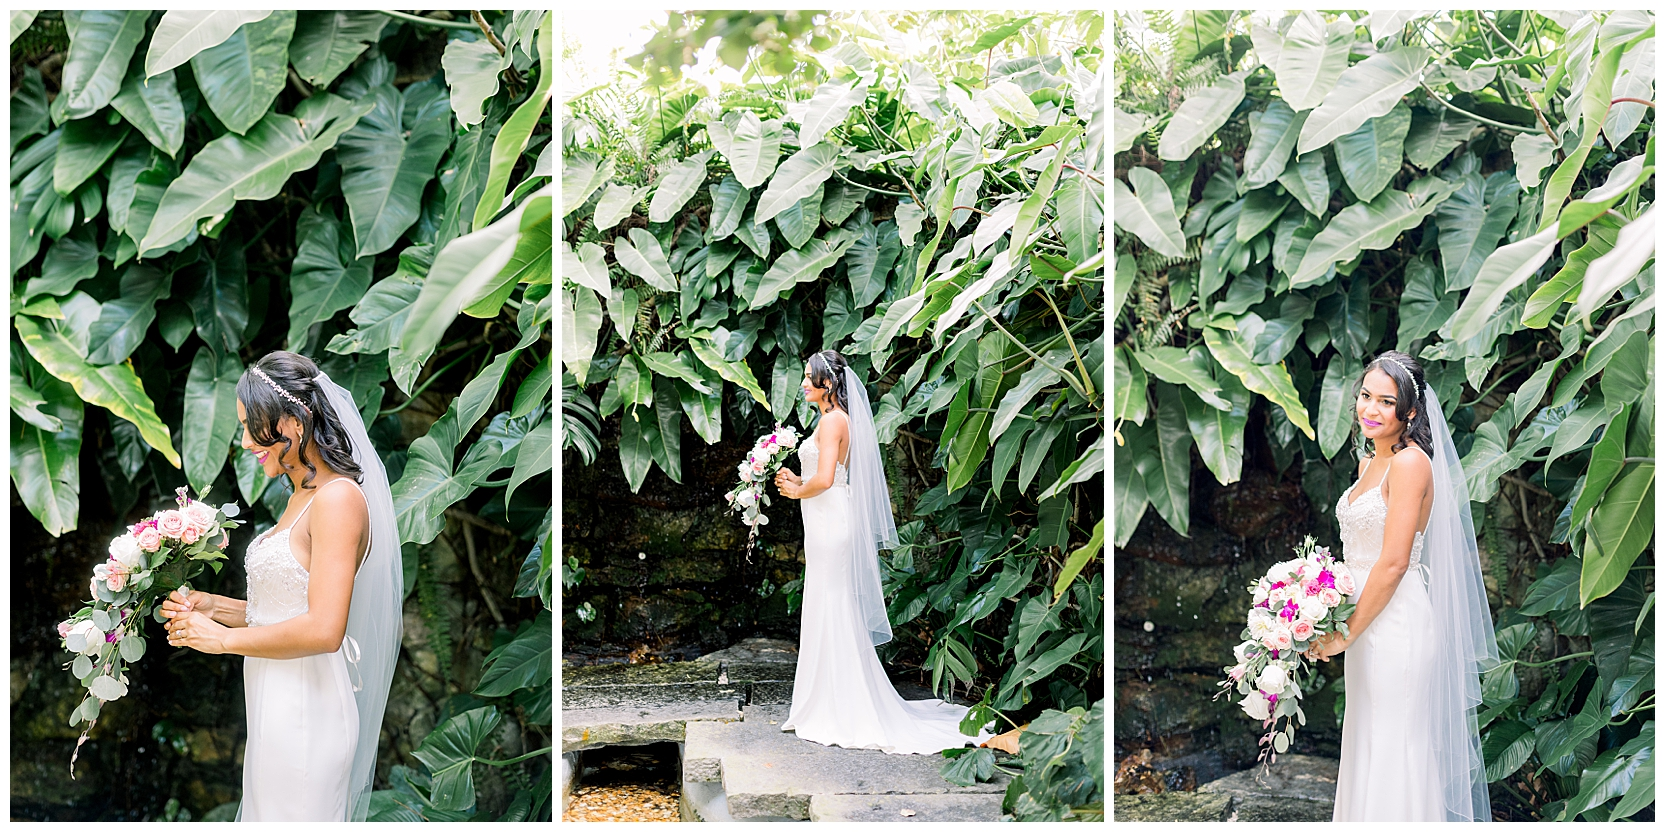 jessicafredericks_lakeland_tampa_wedding_purple_crazy hour_0033.jpg